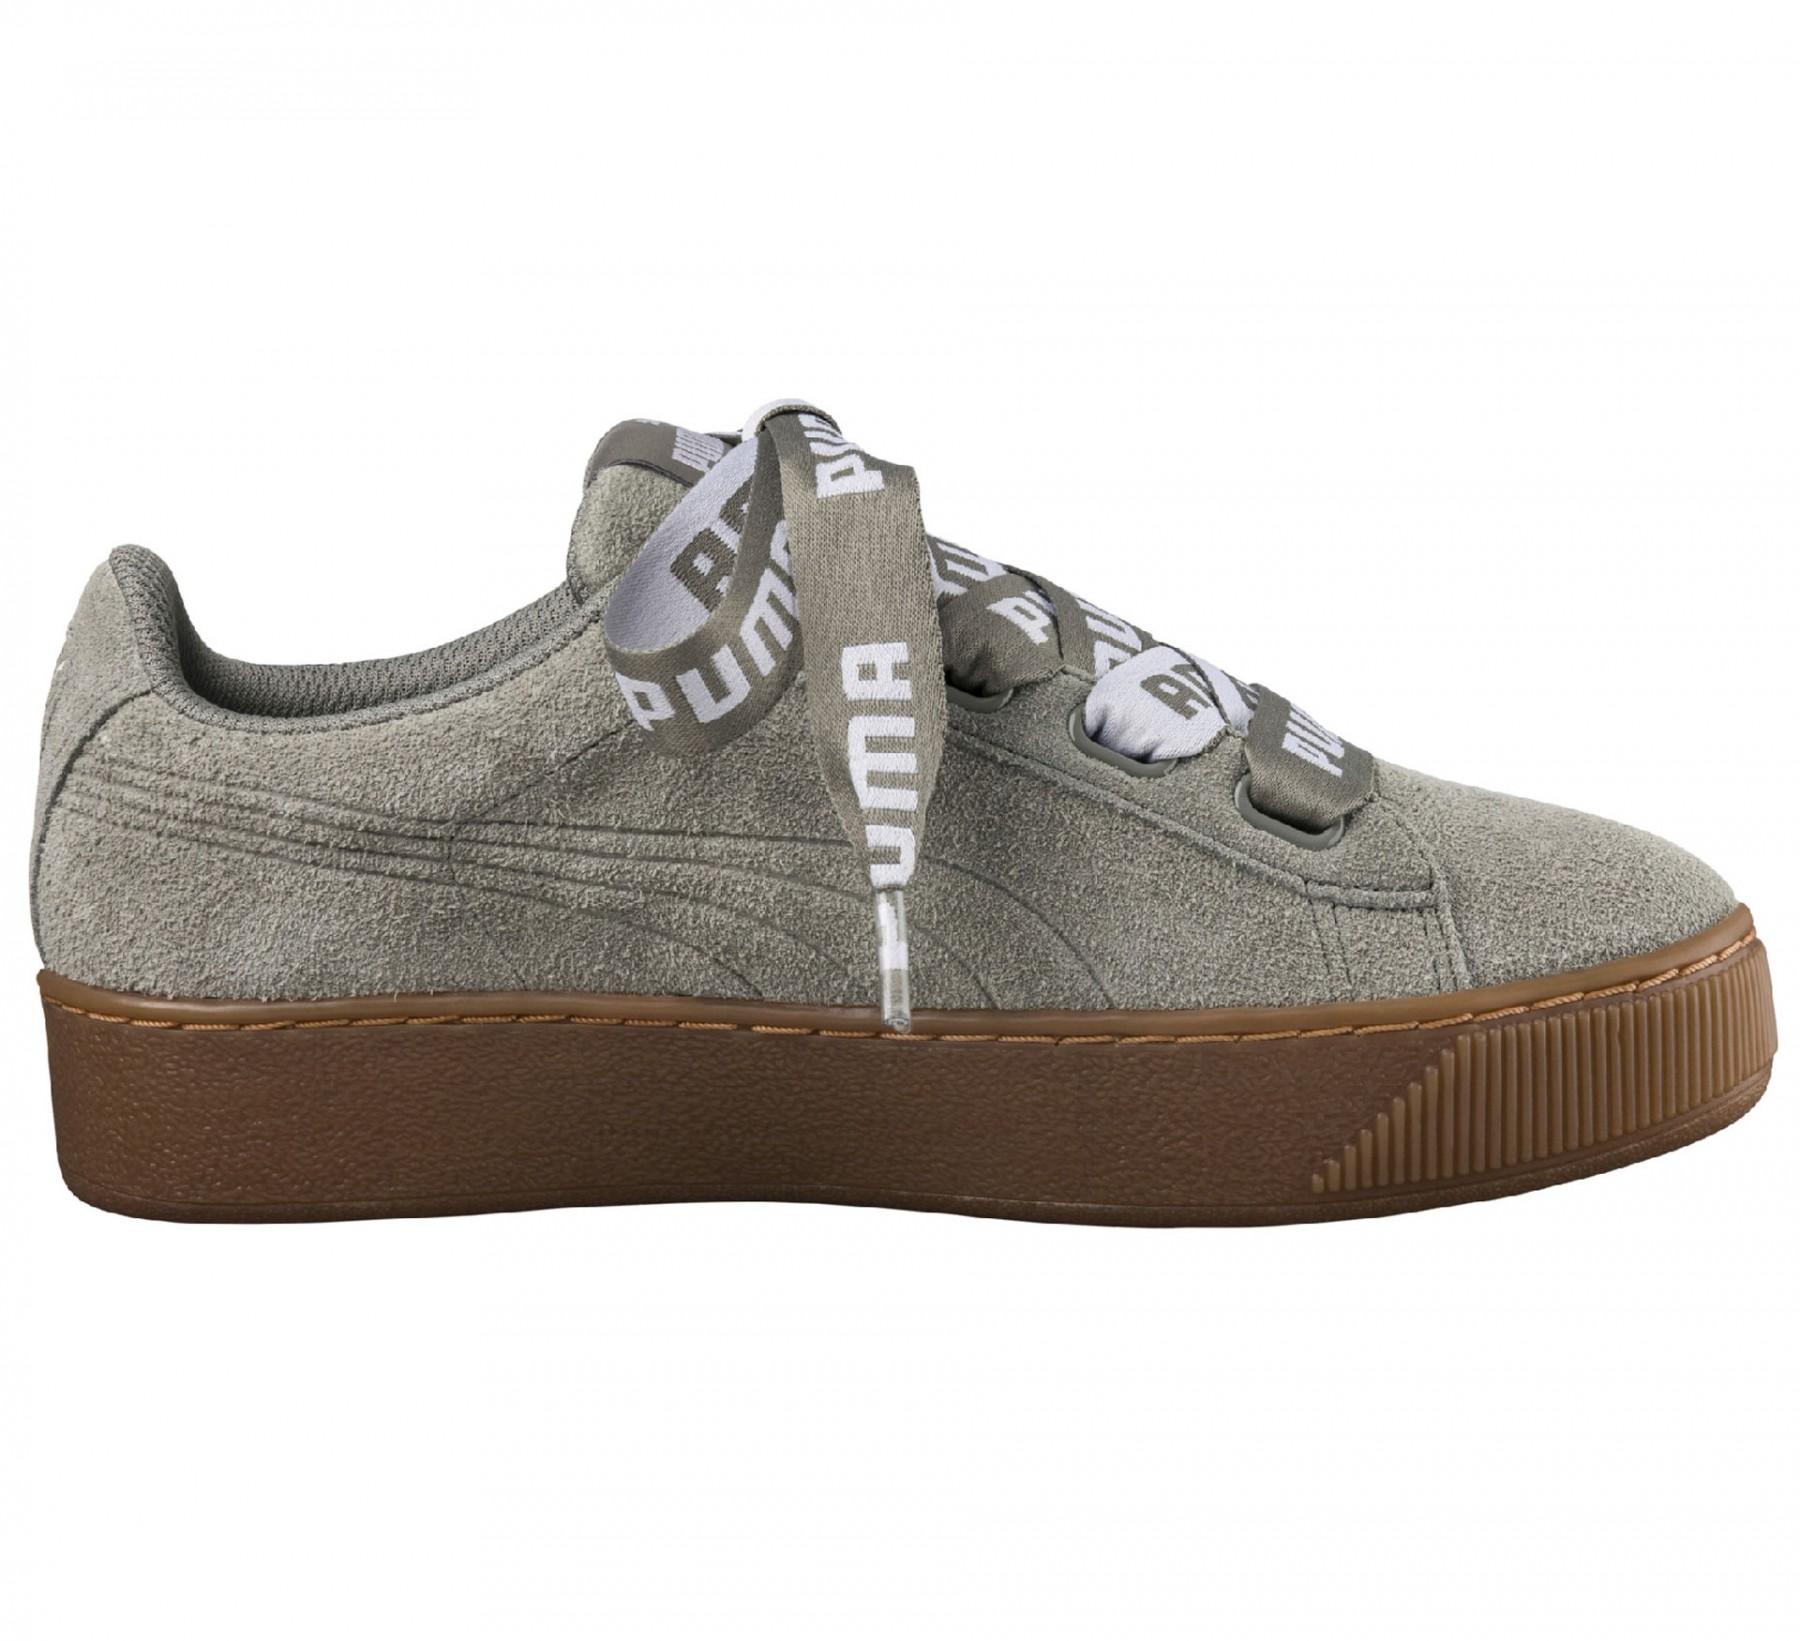 d7ed4e6b666 Groen grijze Dames sneaker Puma Vikky pltfm Ribbon Bold - 365314-03